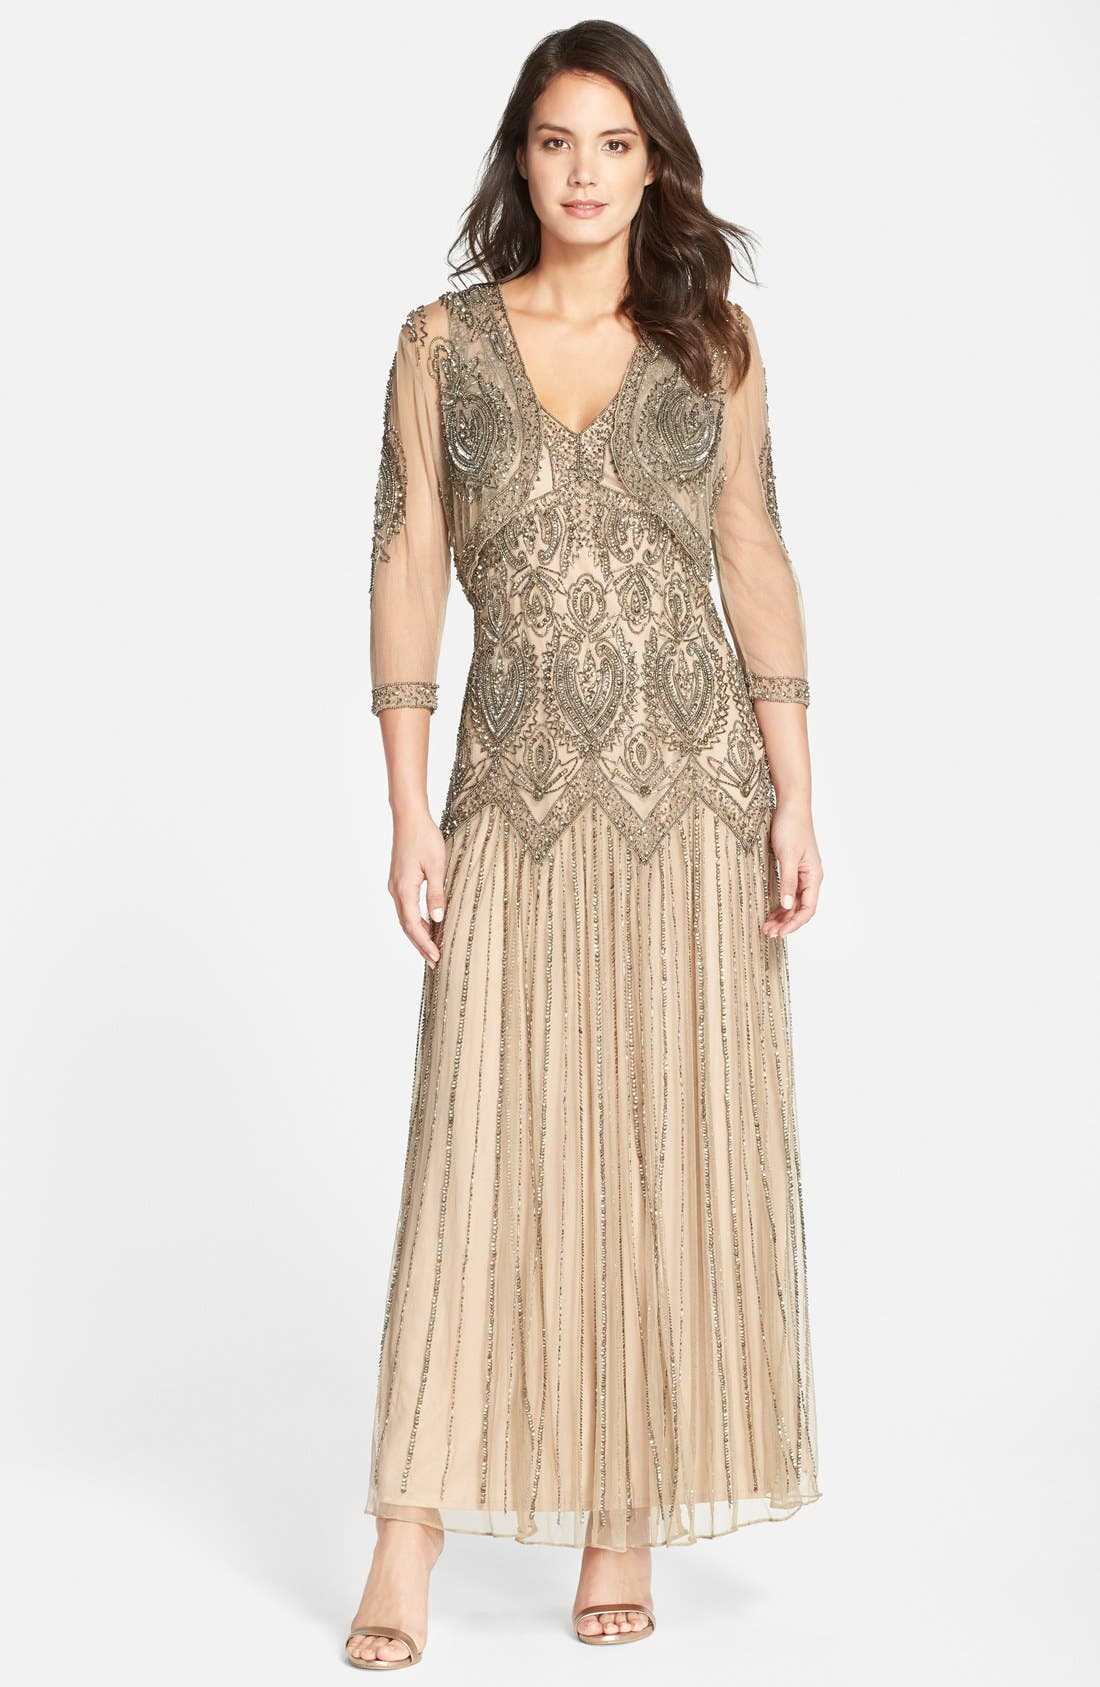 Main Image - Pisarro Nights Embellished Mesh Dress & Jacket